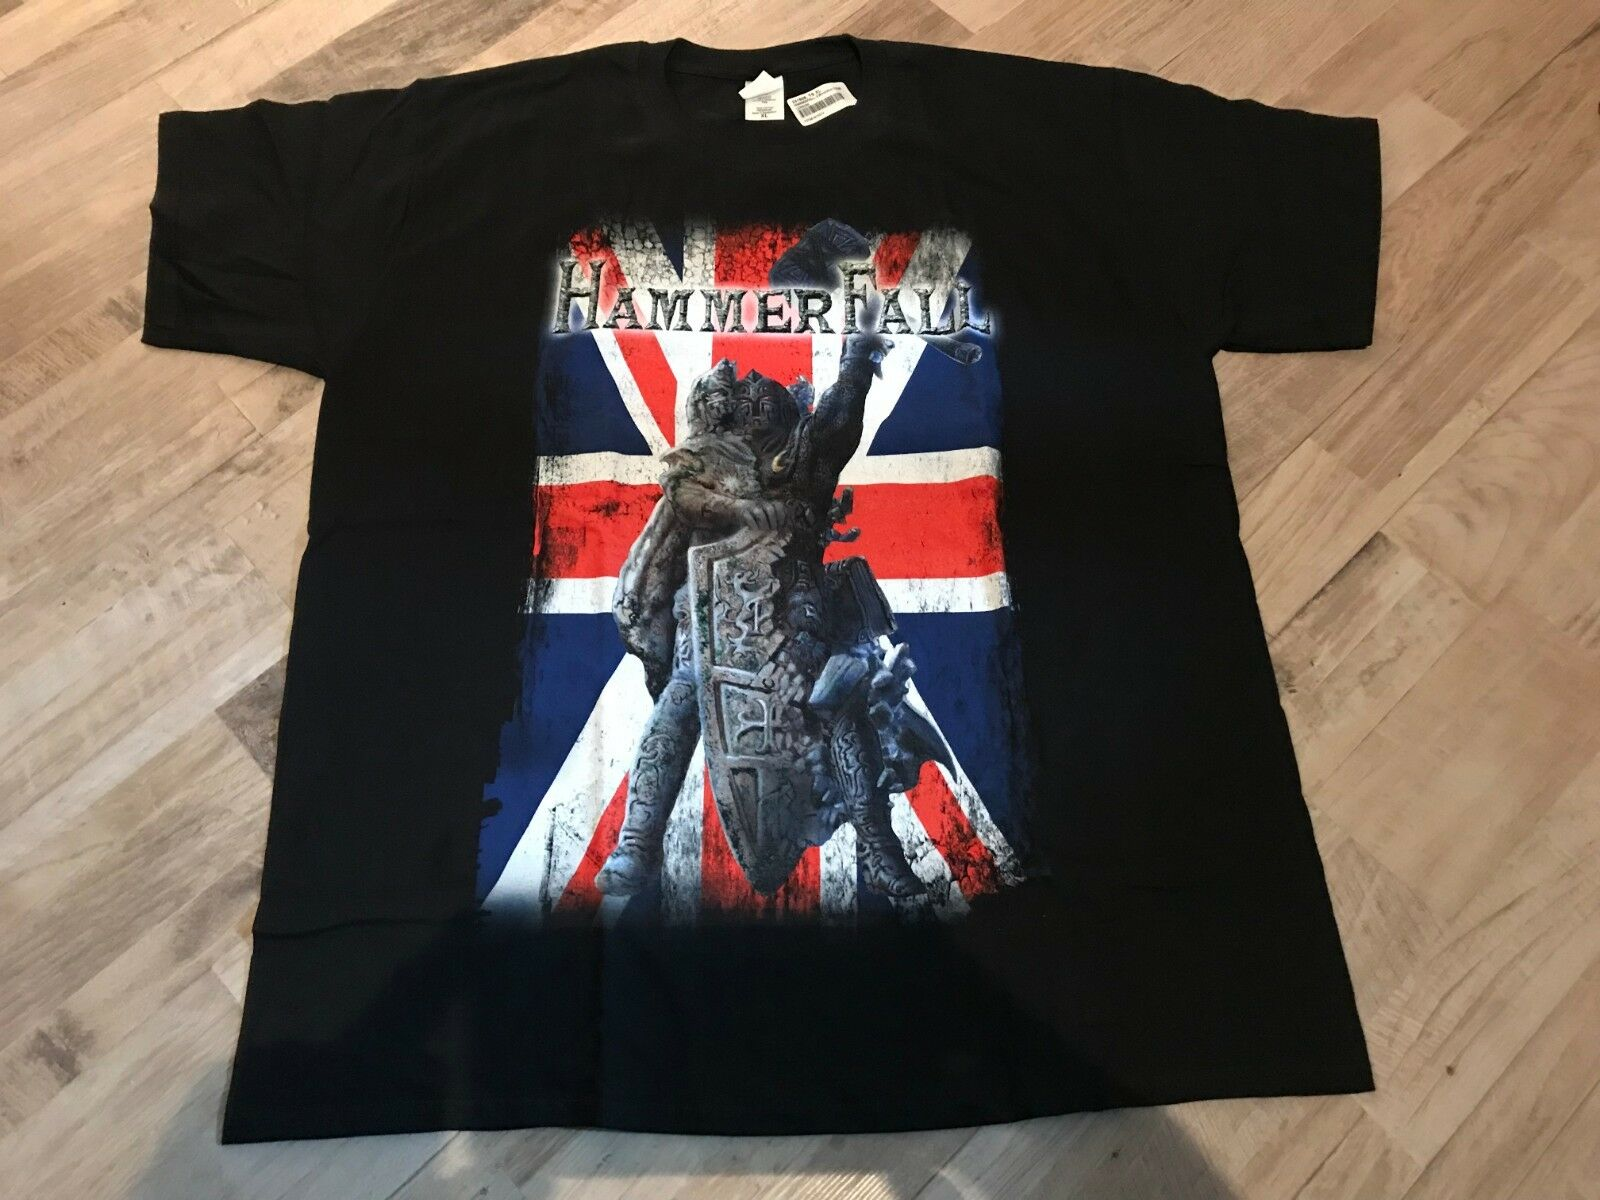 Hammerfall - (r)Evolution Tour - London  09.05.2015 - T-hemd XL - RAR - NEU